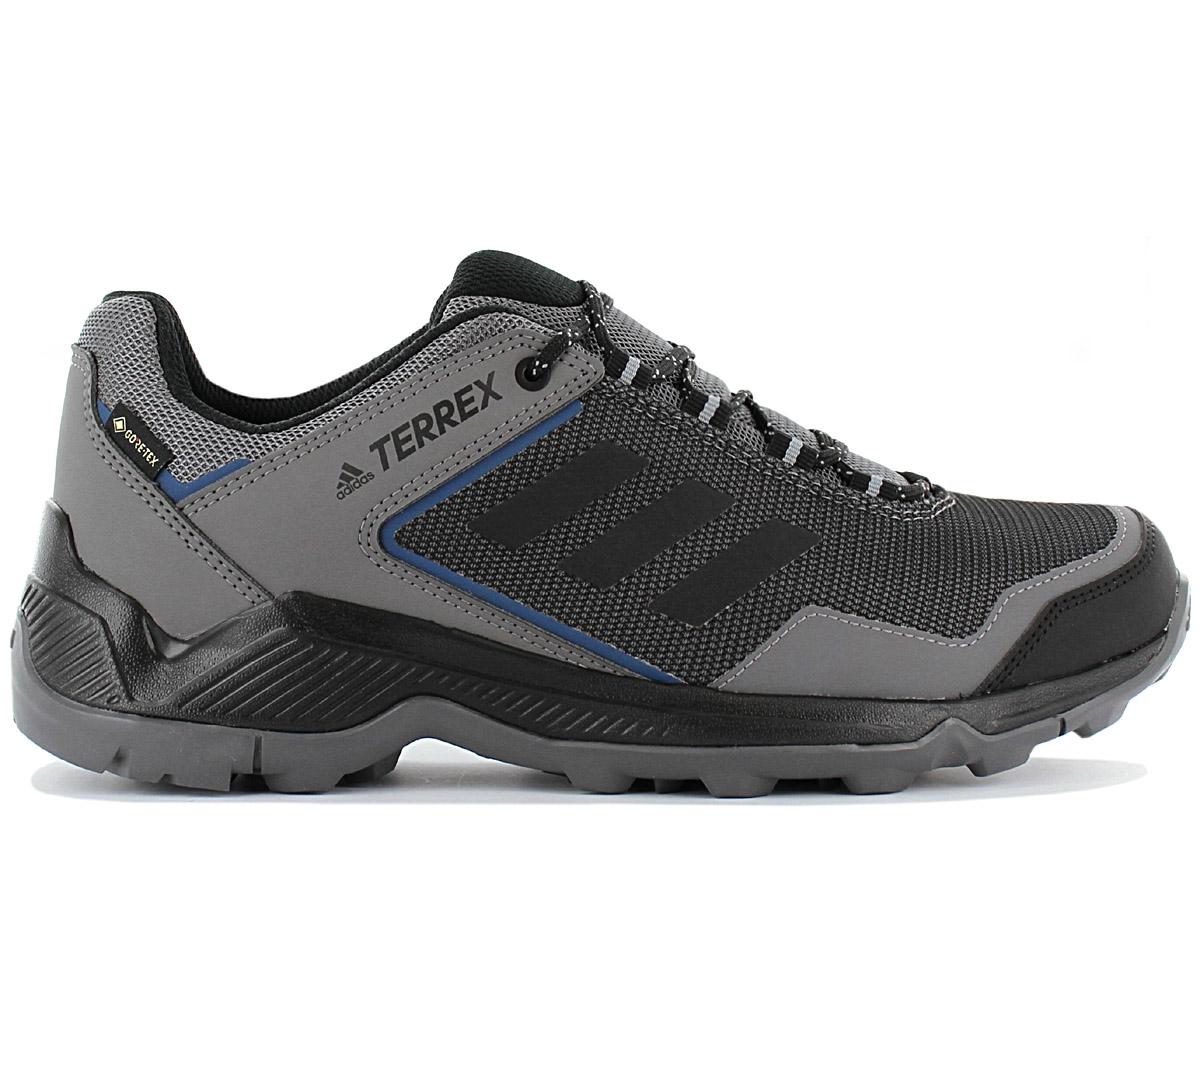 Sonderangebot adidas TERREX Two GTX Low Cut Schuhe Herren